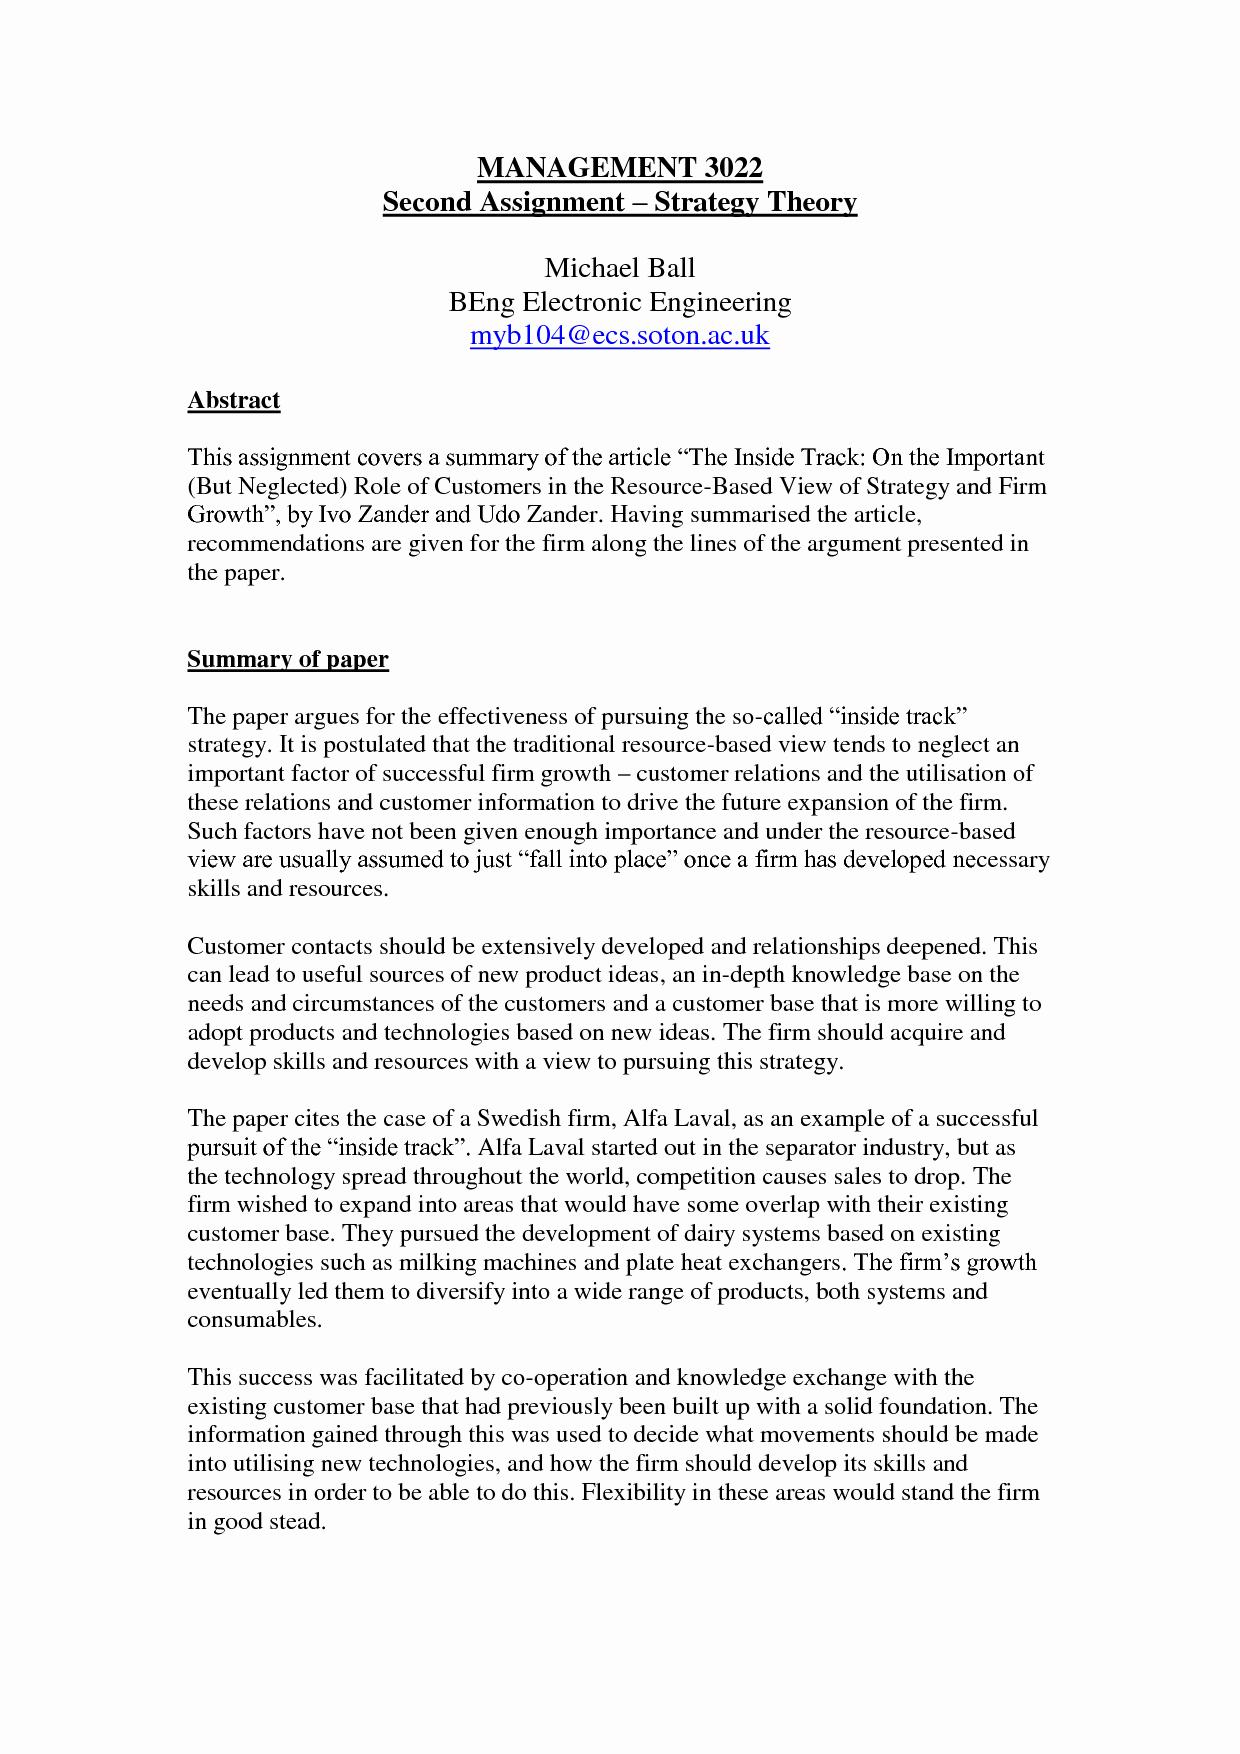 Ut Austin Recommendation Letter Elegant 44 Example A Summary Essay Writing Summaries